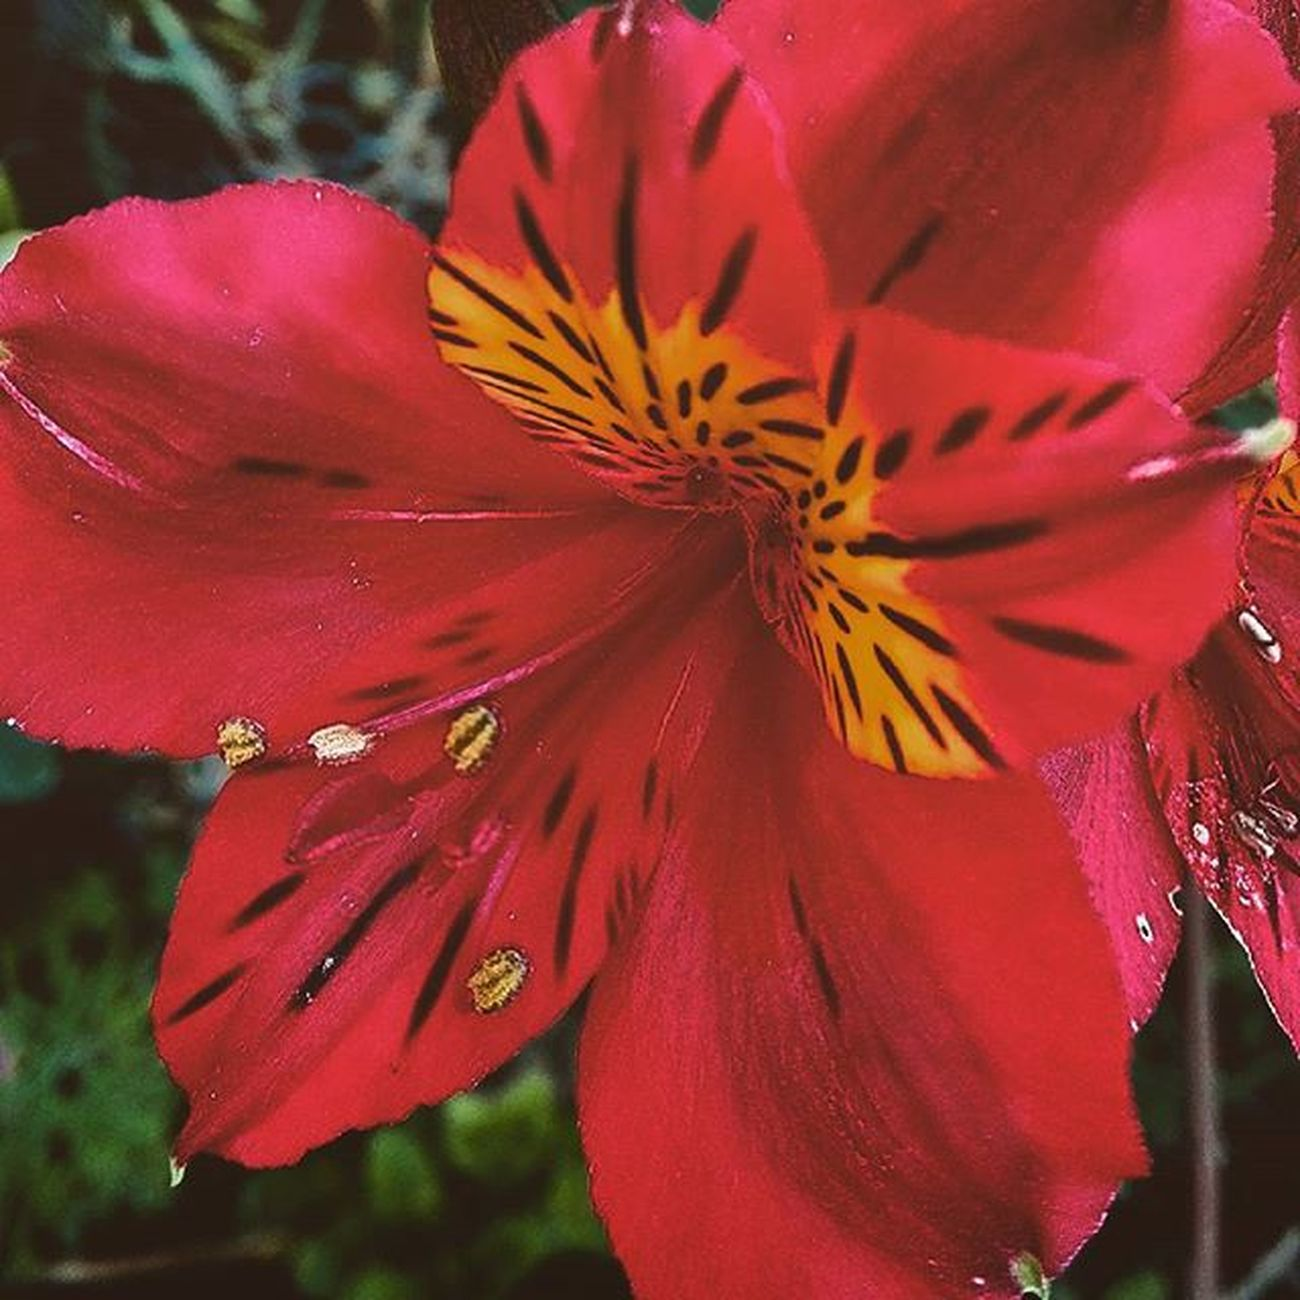 Tt_wt_rflora 9Vaga_ColorRed9 Af_floral Pocket_pretty Nature Ptk_flowers_red1 Hello_red